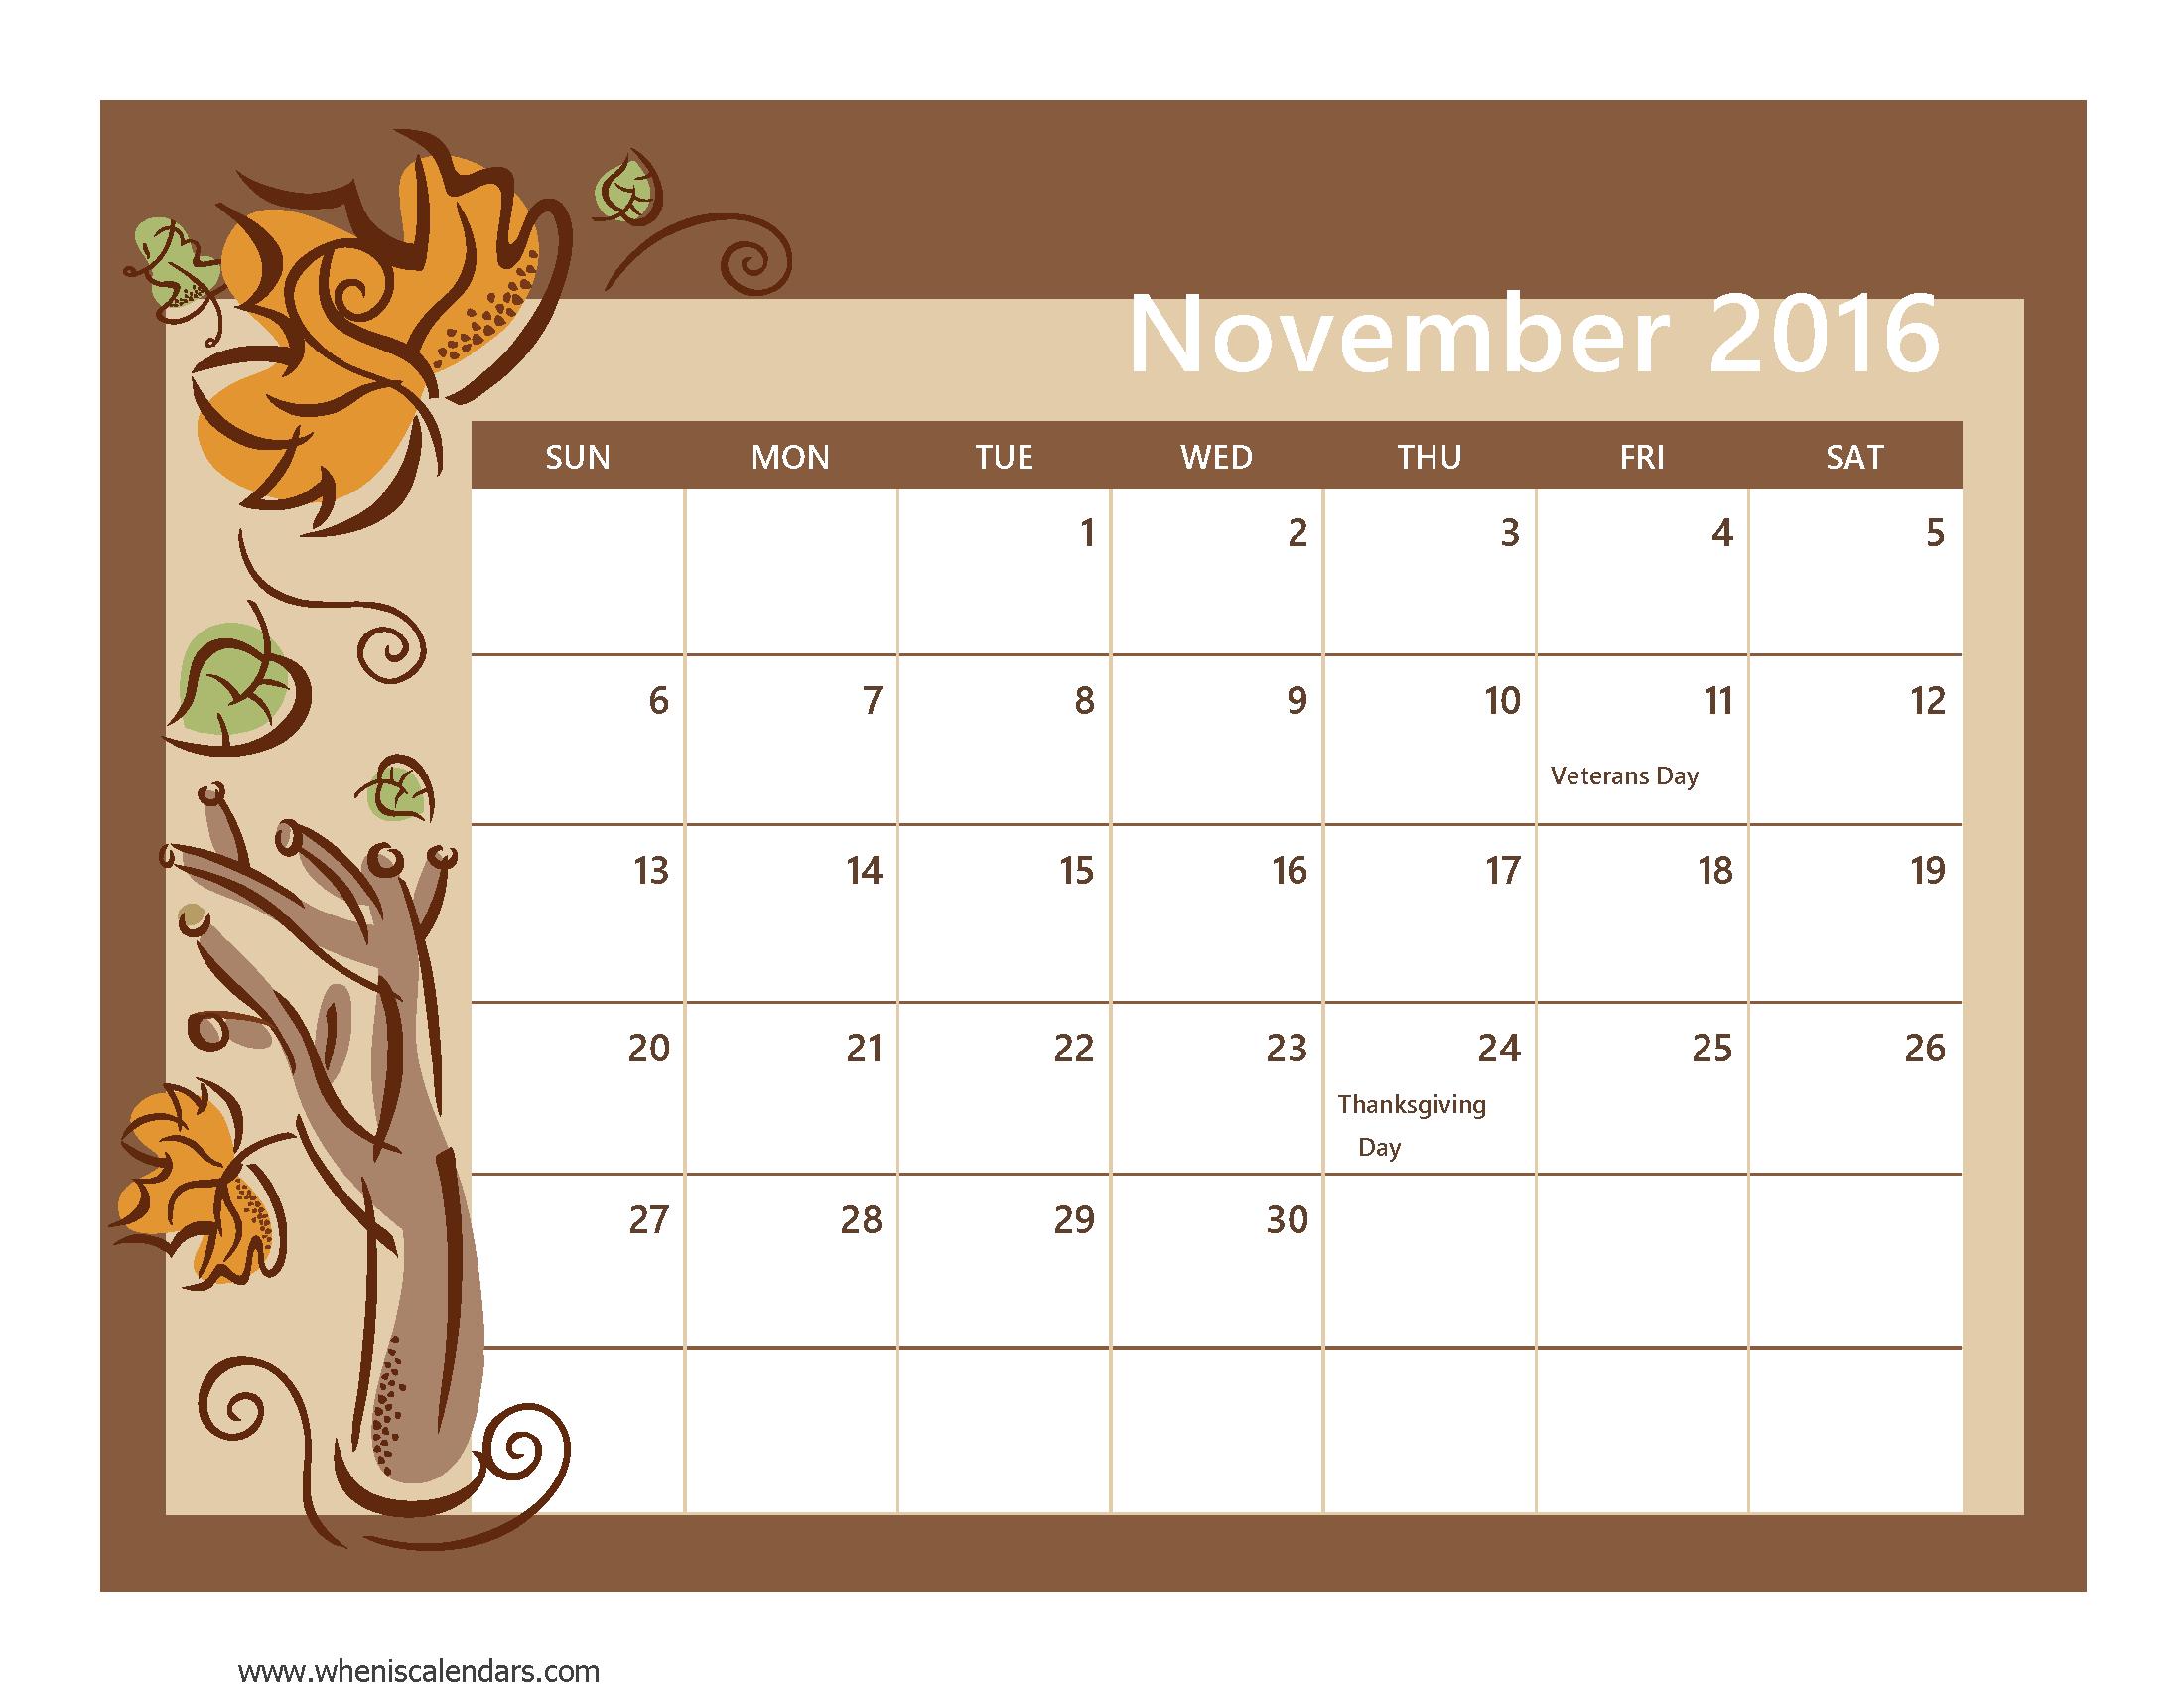 Monthly calendar november 2016 clipart.